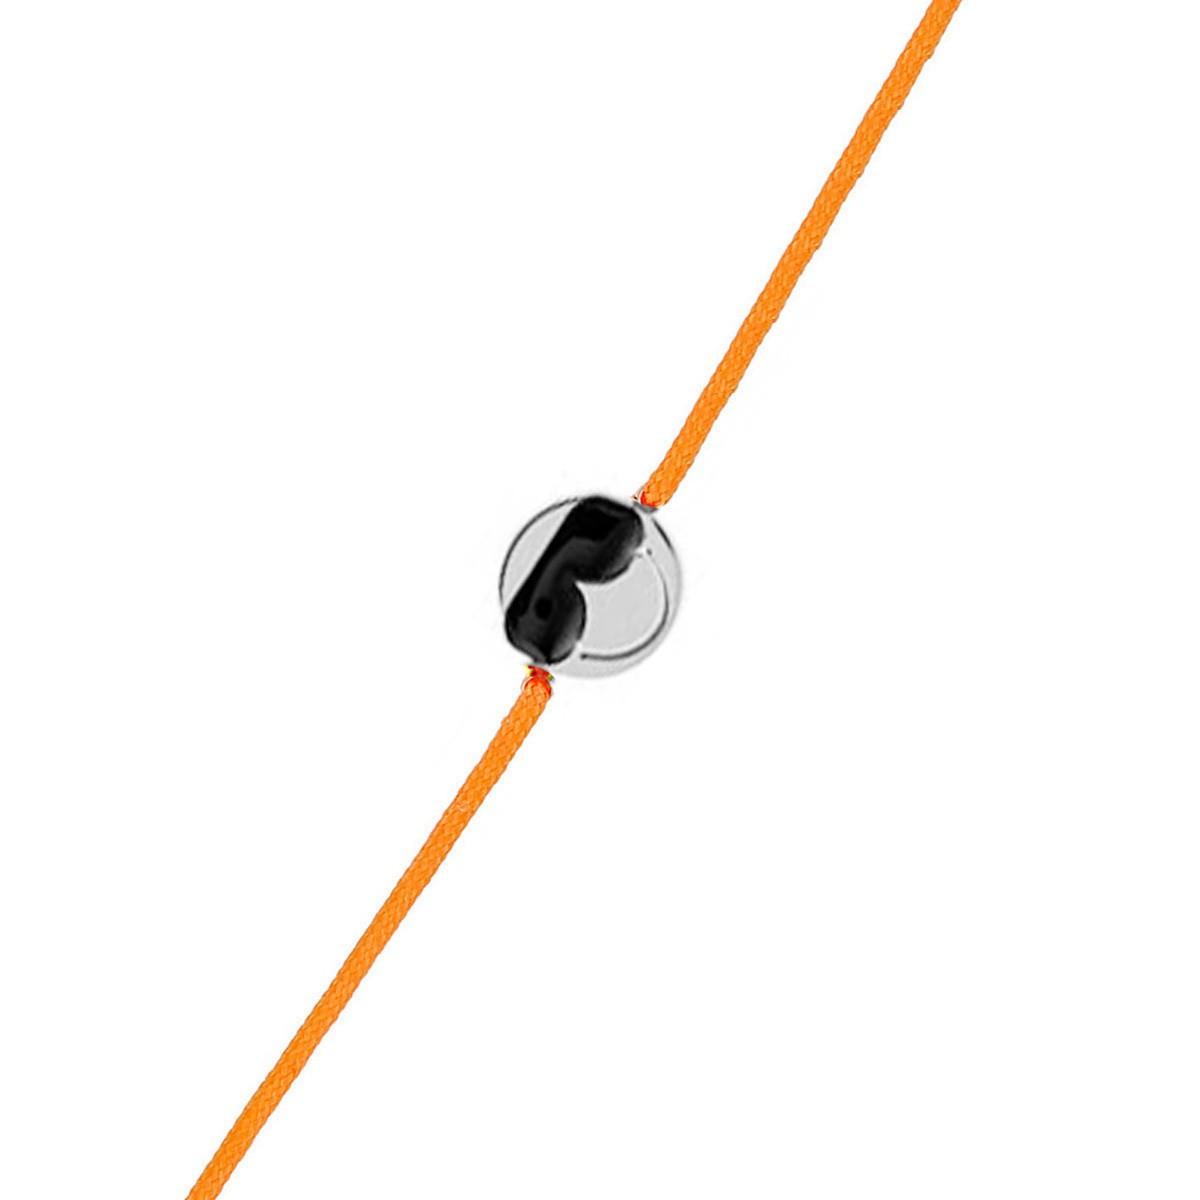 Bracelet Femme Smiley Cool Cordon Orange En Argent 925